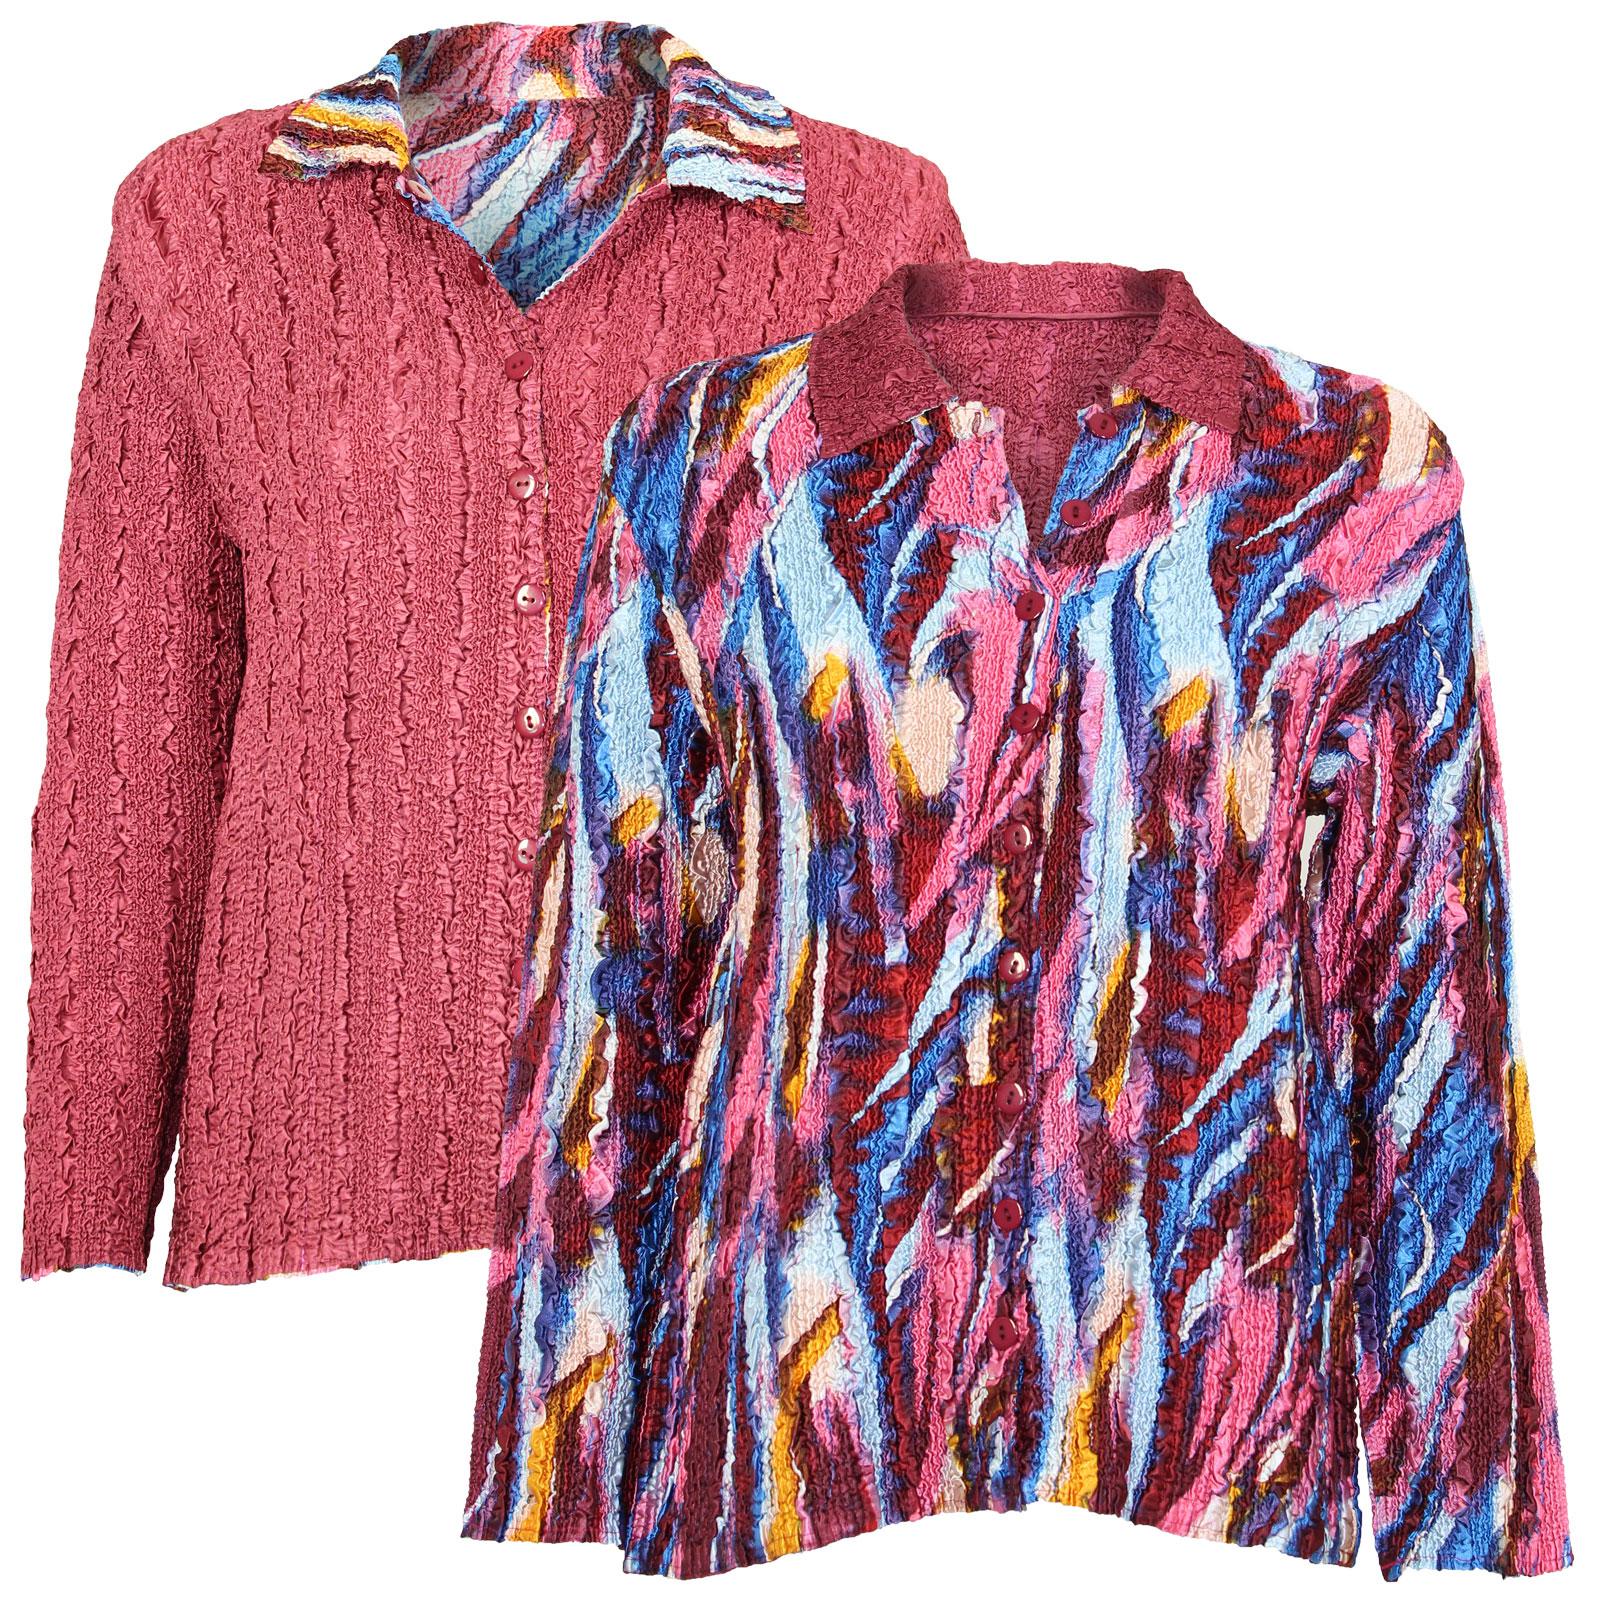 Wholesale Magic Crush - Reversible Jackets #14015 - S-M